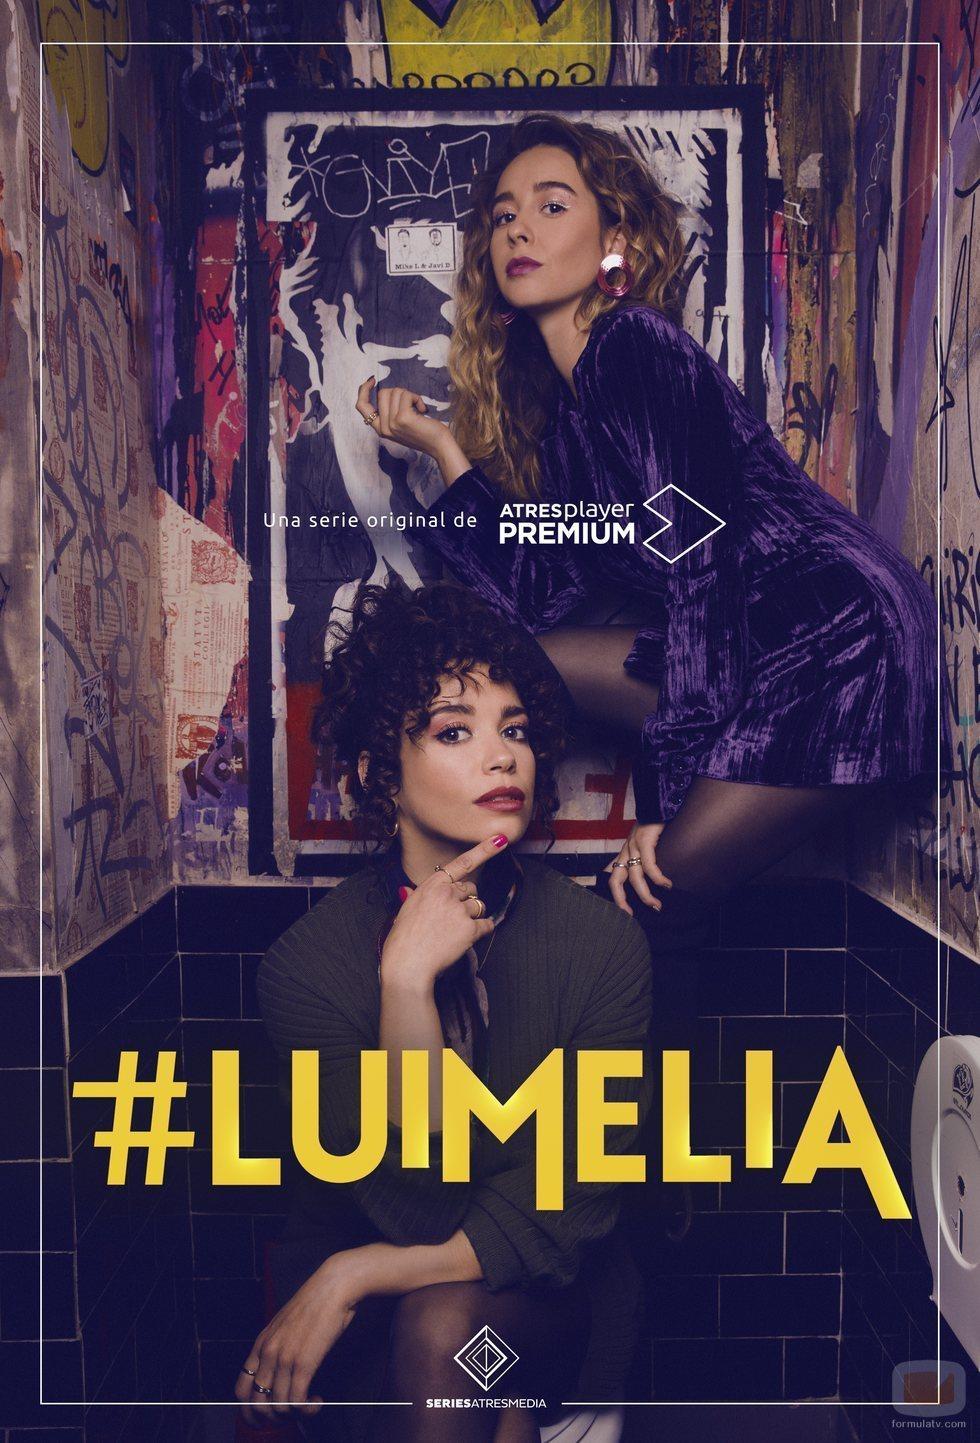 Cartel vertical de '#Luimelia', serie de Atresplayer Premium